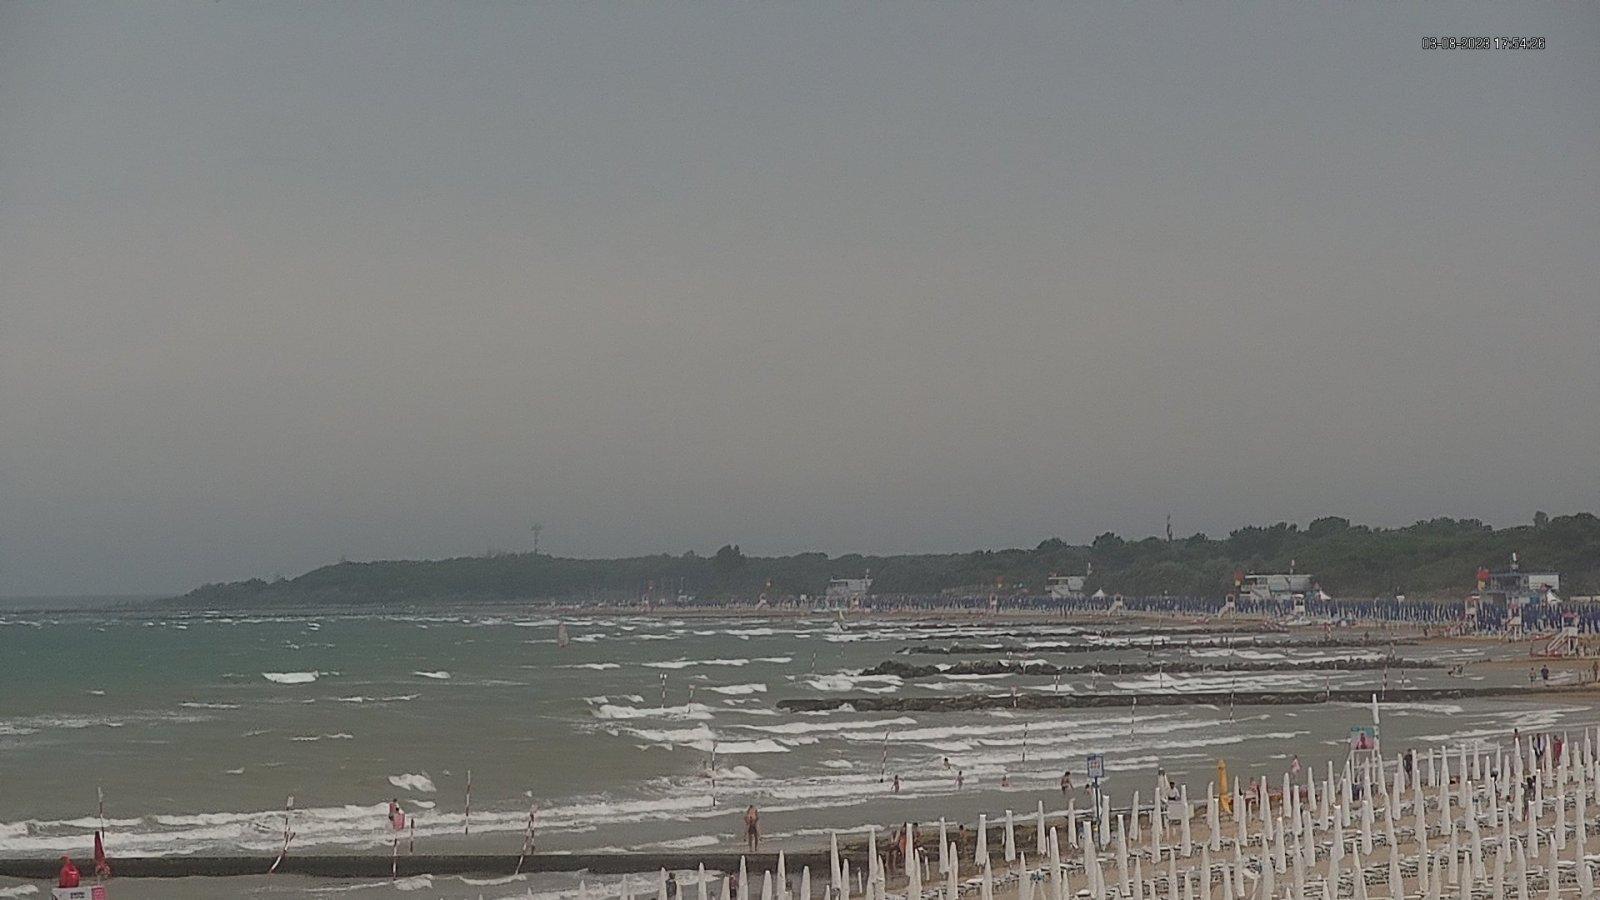 Webcam in Lignano Riviera view onto the beach